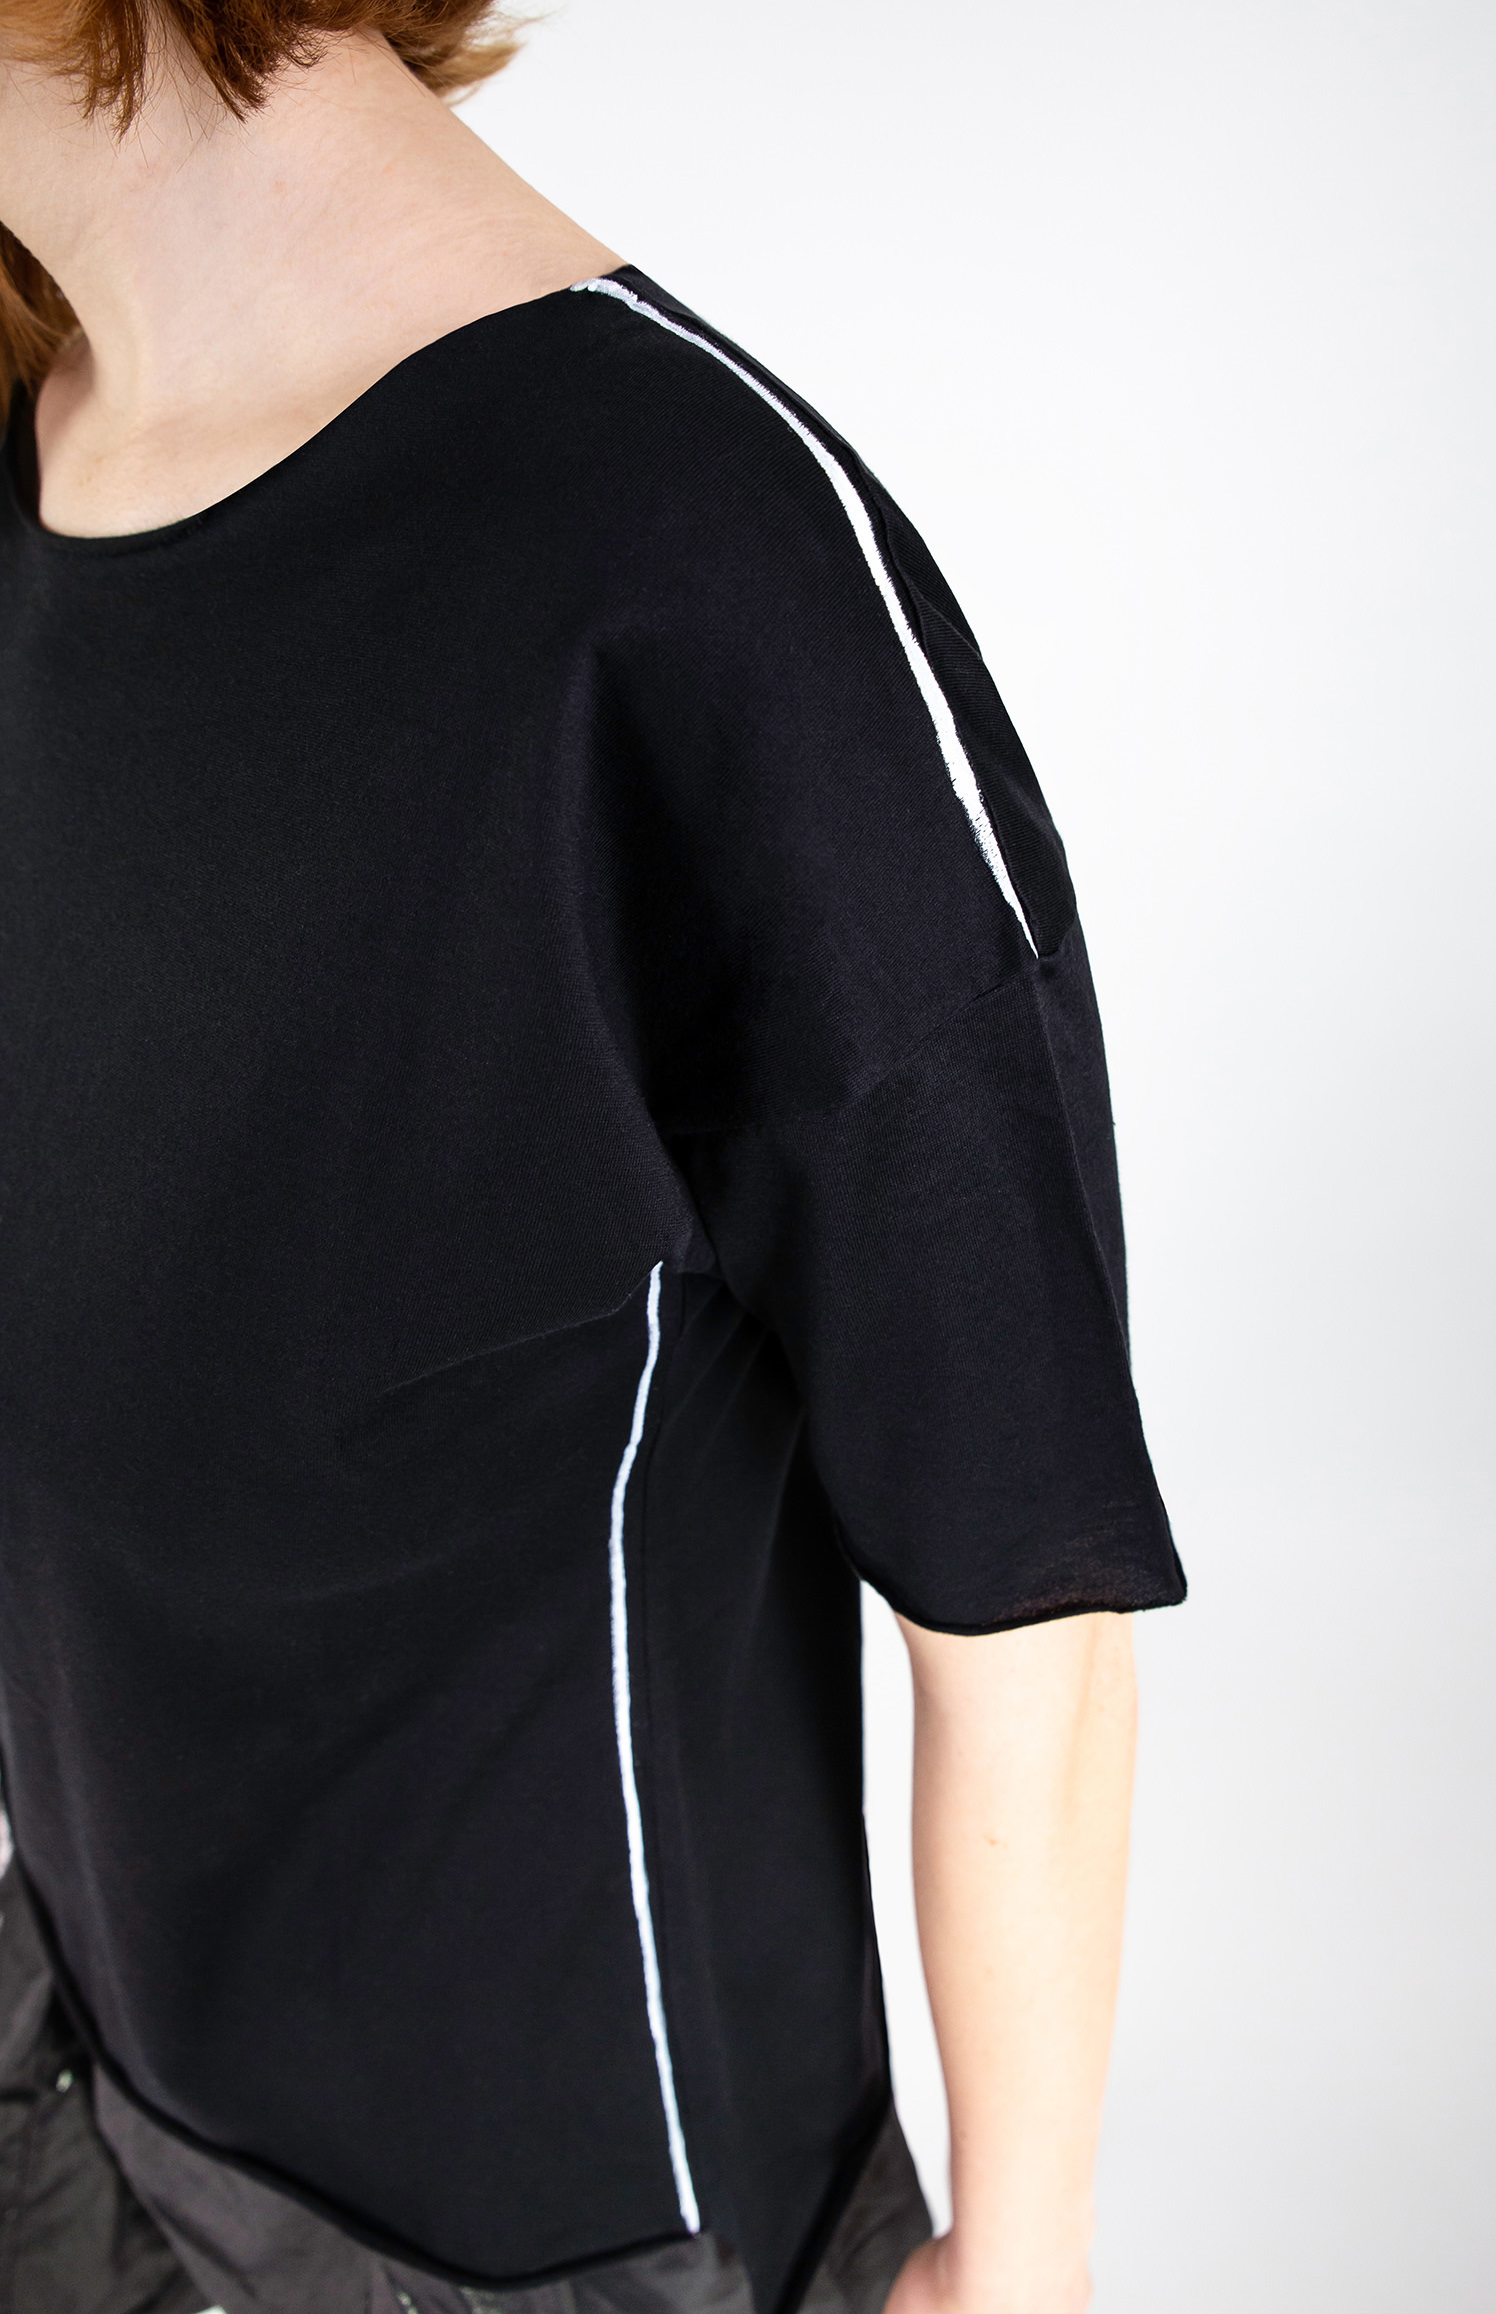 Img 7264 Lijn T Shirt Woman Black